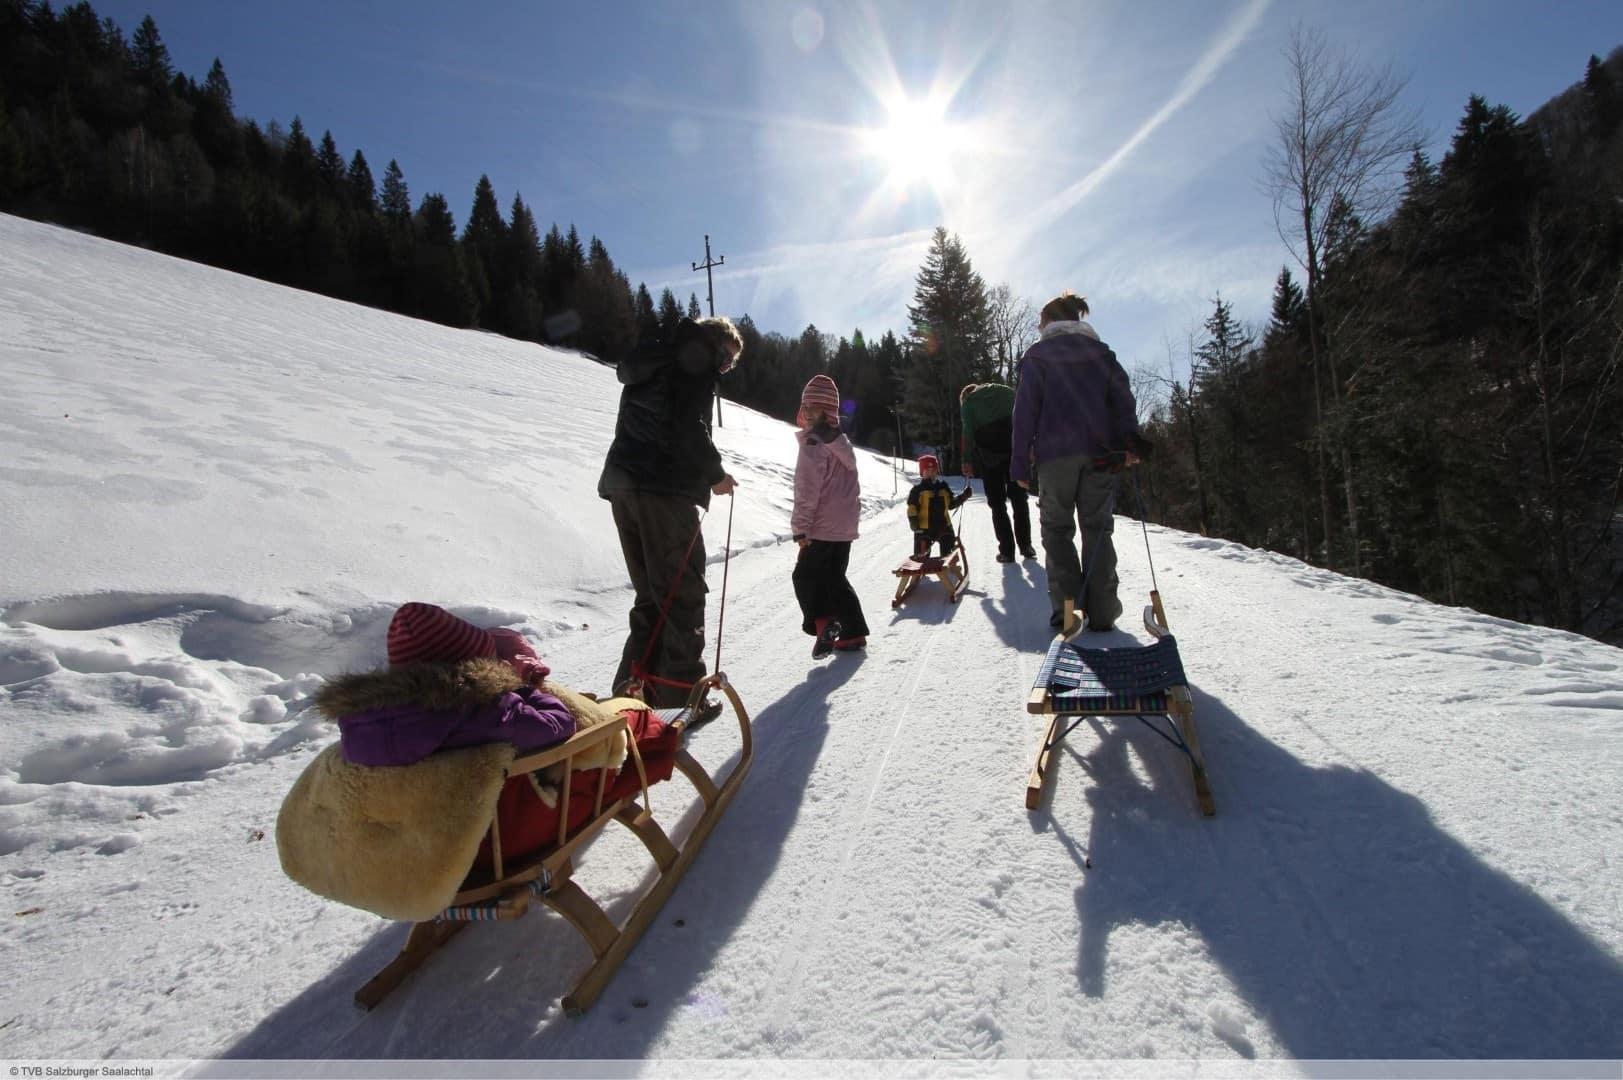 après-ski in Unken